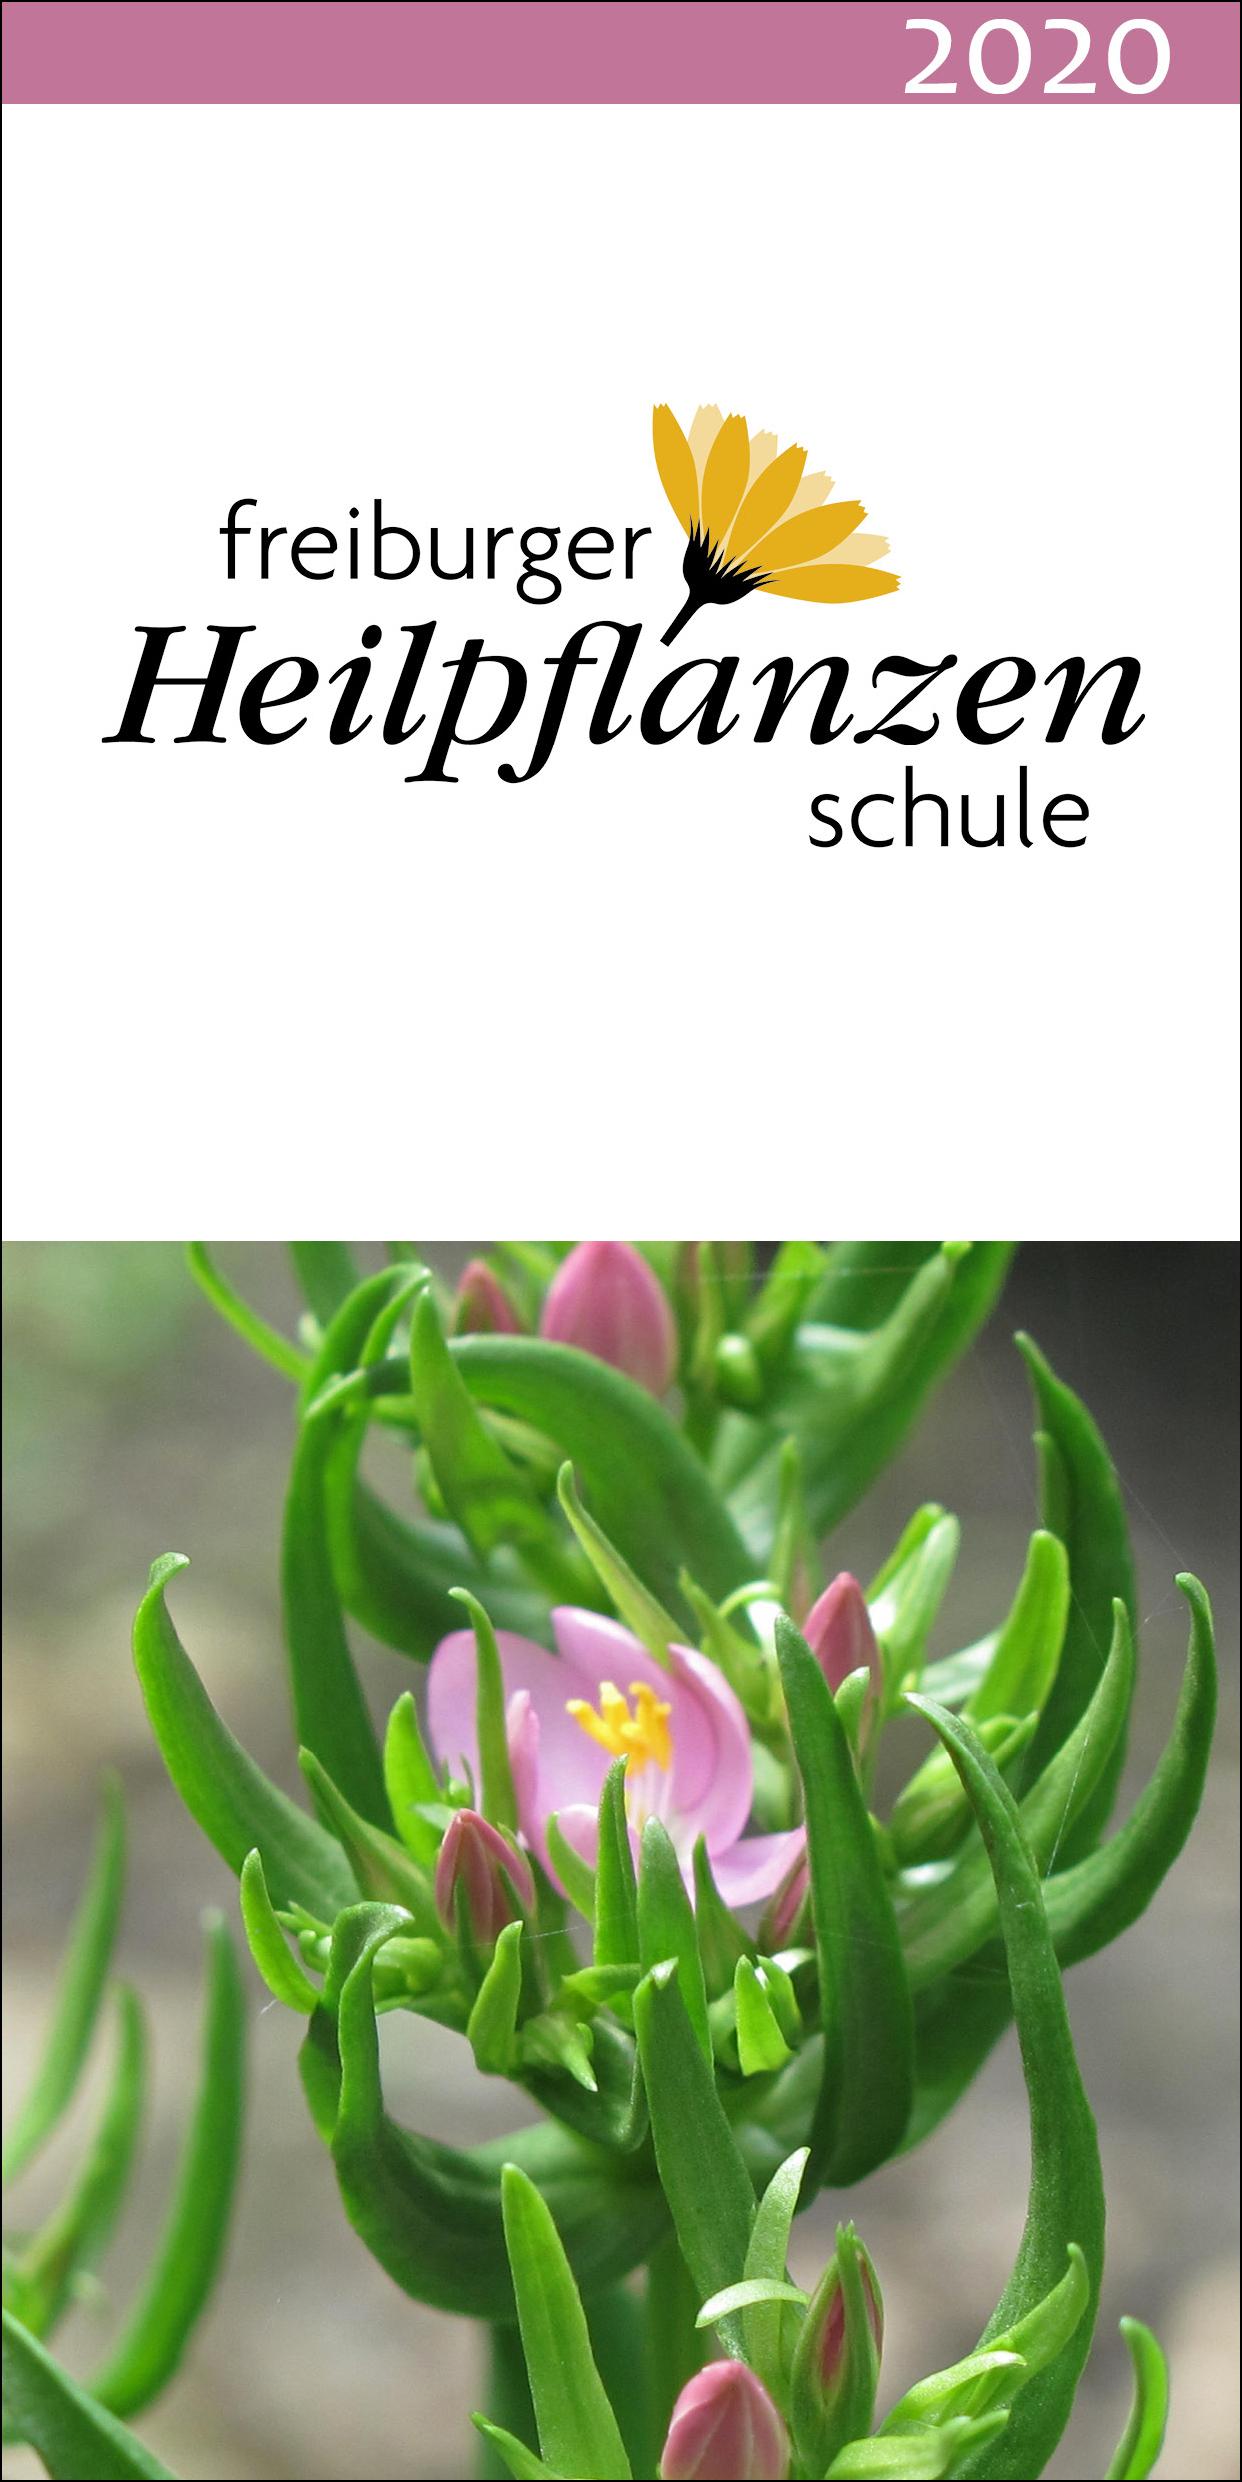 Freiburger Heilpflanzenschule Programm 2019></a></p> <p><a href=